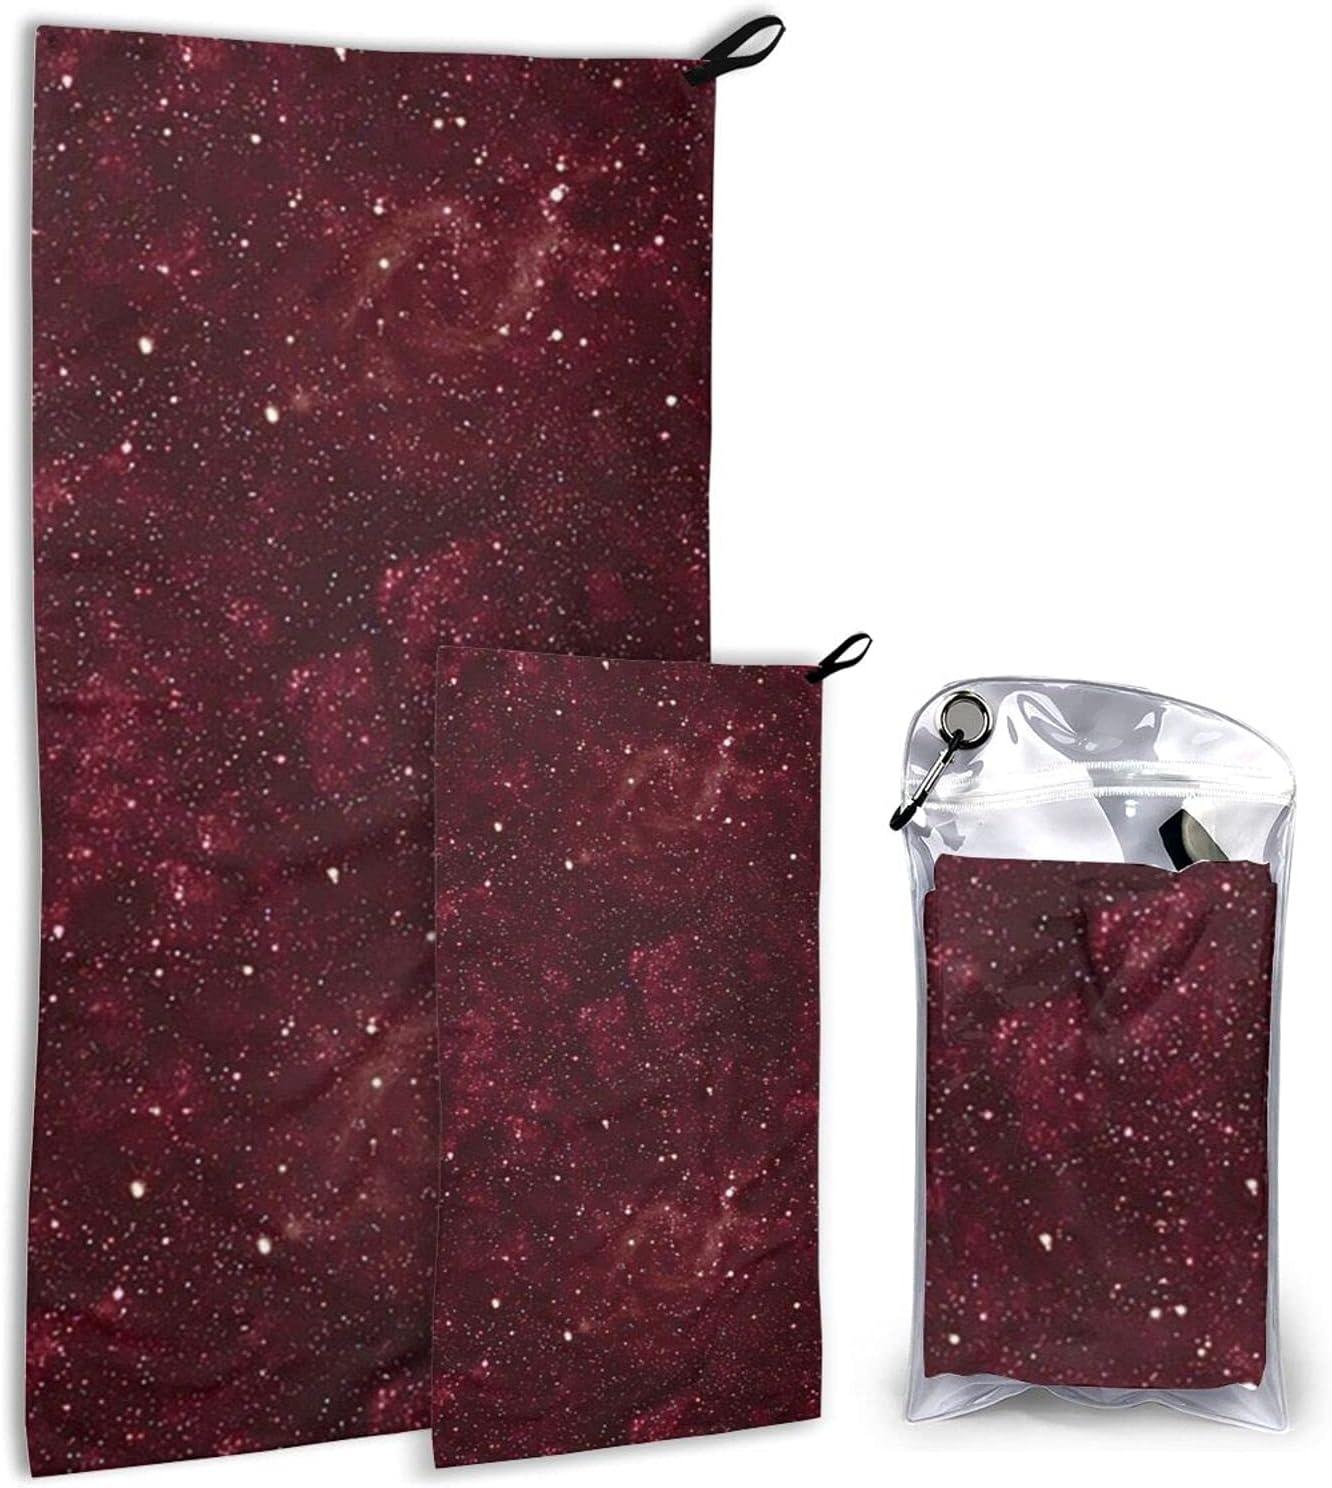 Maroon Galaxy Very popular Microfiber Regular dealer Towels 2 Pack Dry Tow - Camping Quick